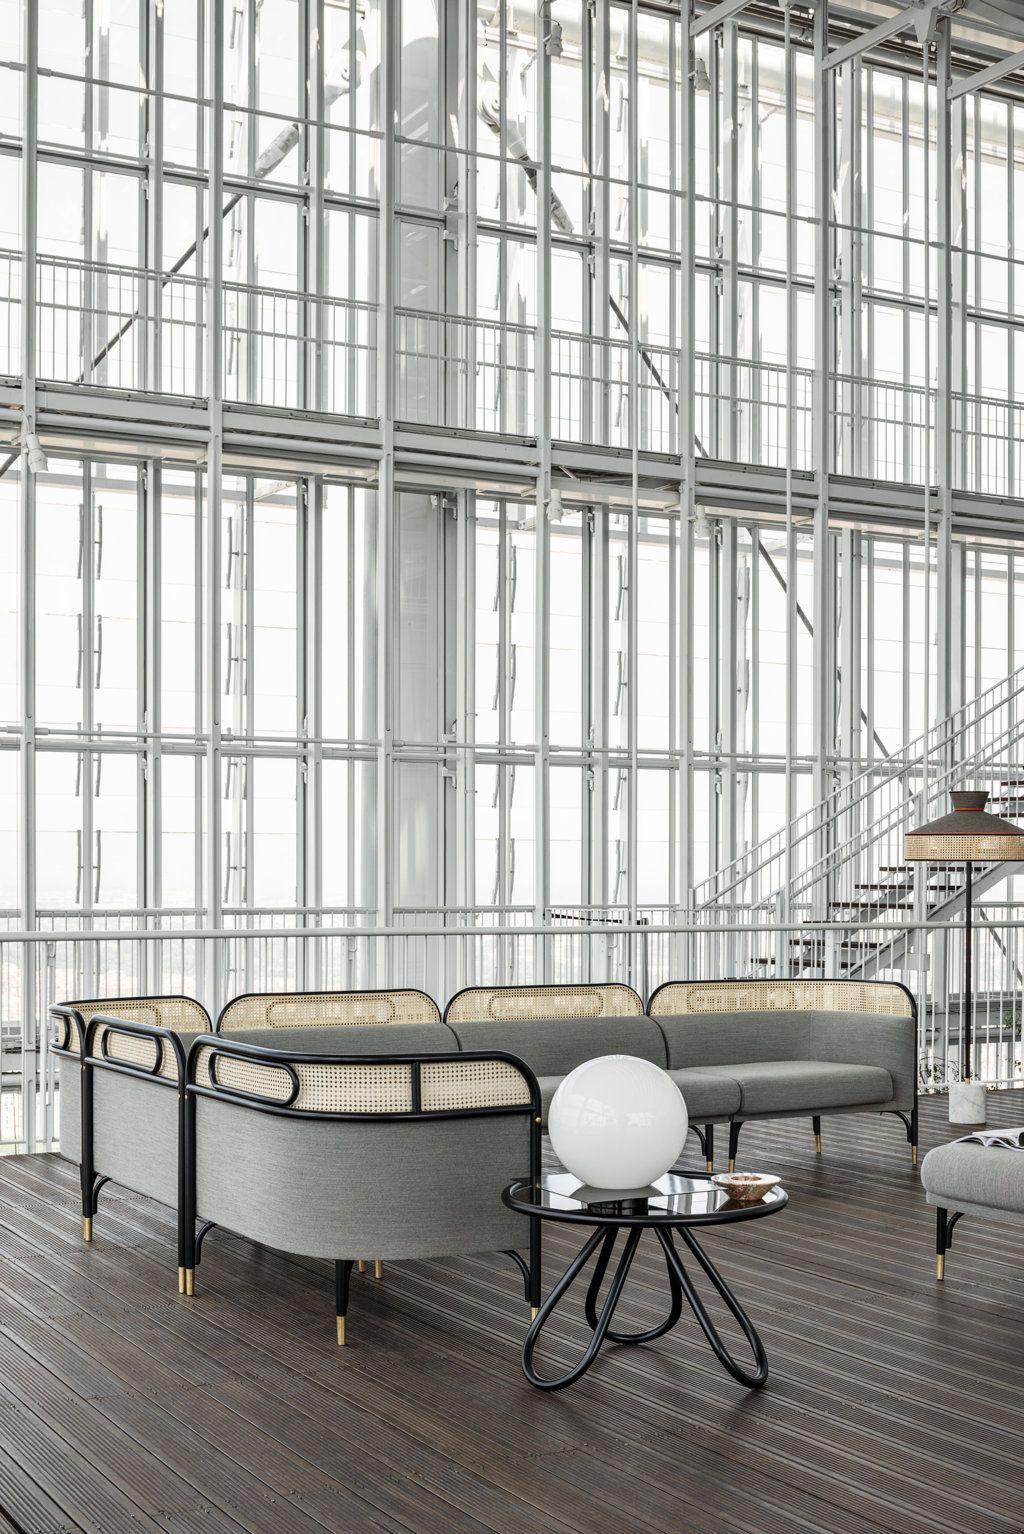 Targa Modular Sofa Mit Bildern Modulares Sofa Sofa Lounge Grosse Sitzkissen